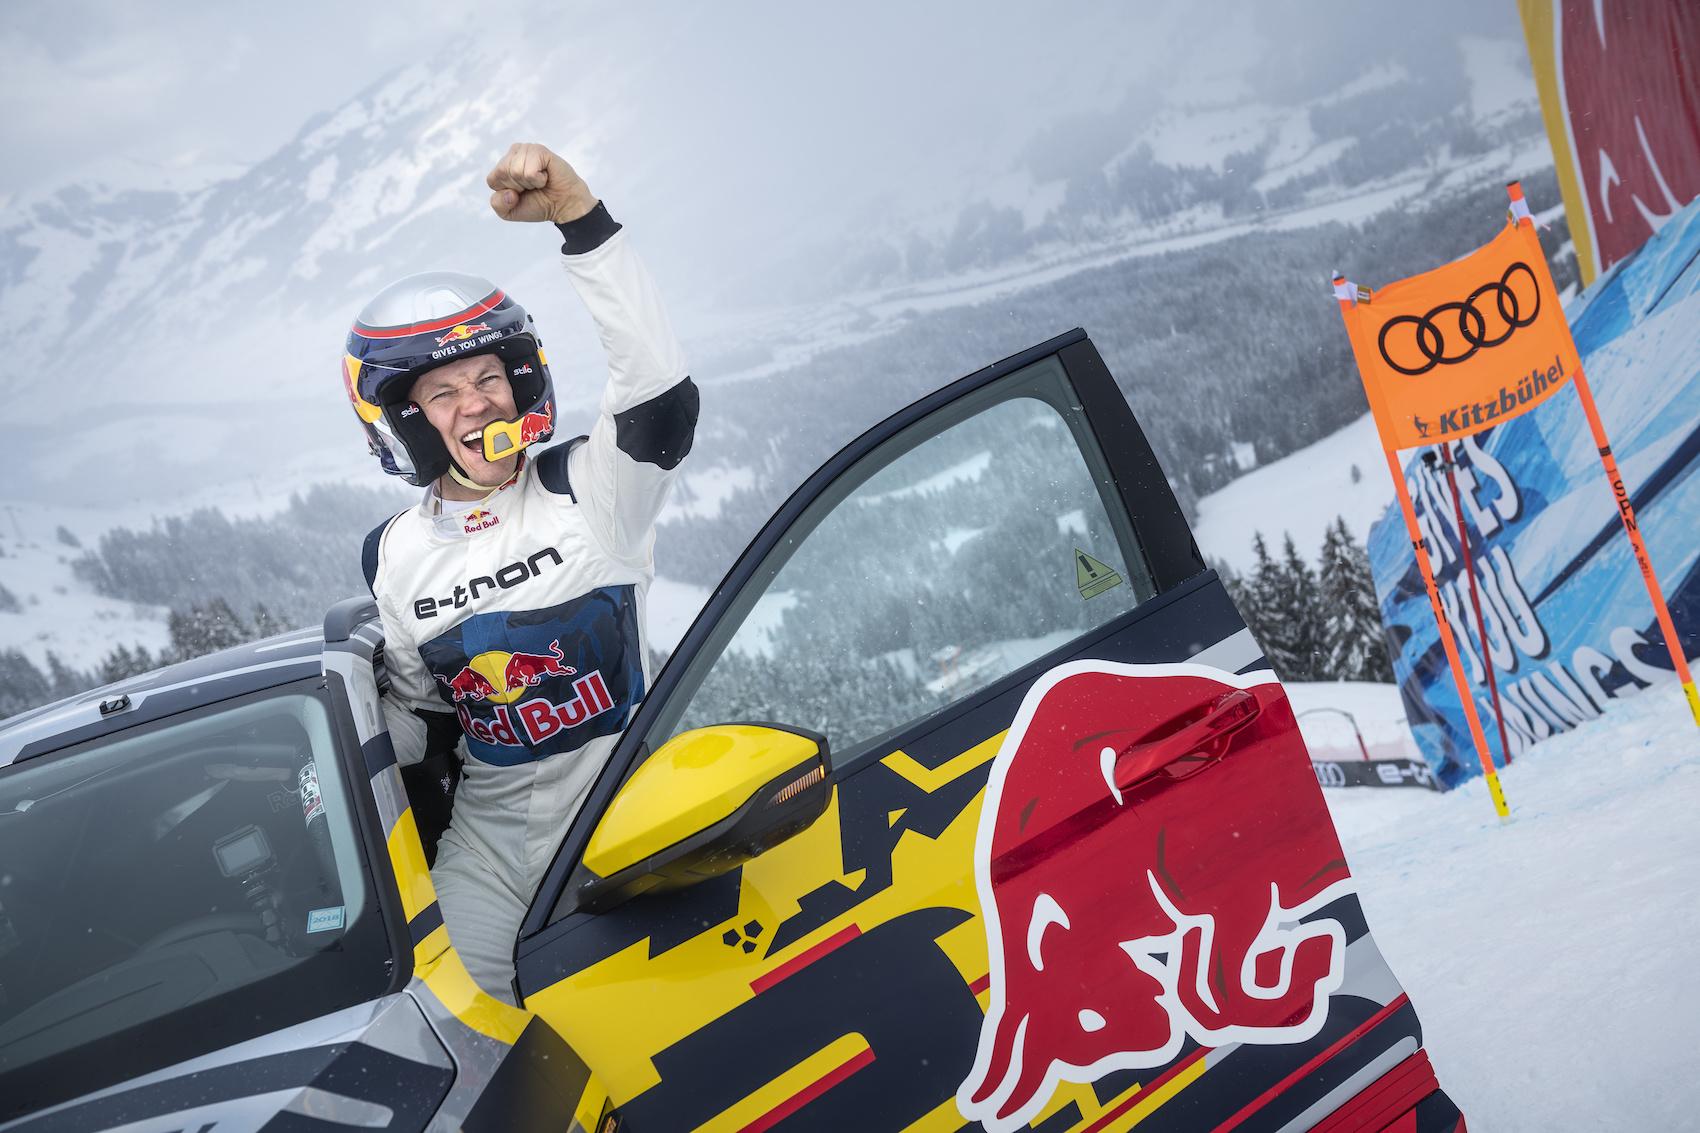 Rallycross-Weltmeister Mattias Ekström hat die «Mausefallen»-Challenge gemeistert. (Foto: AUDI)